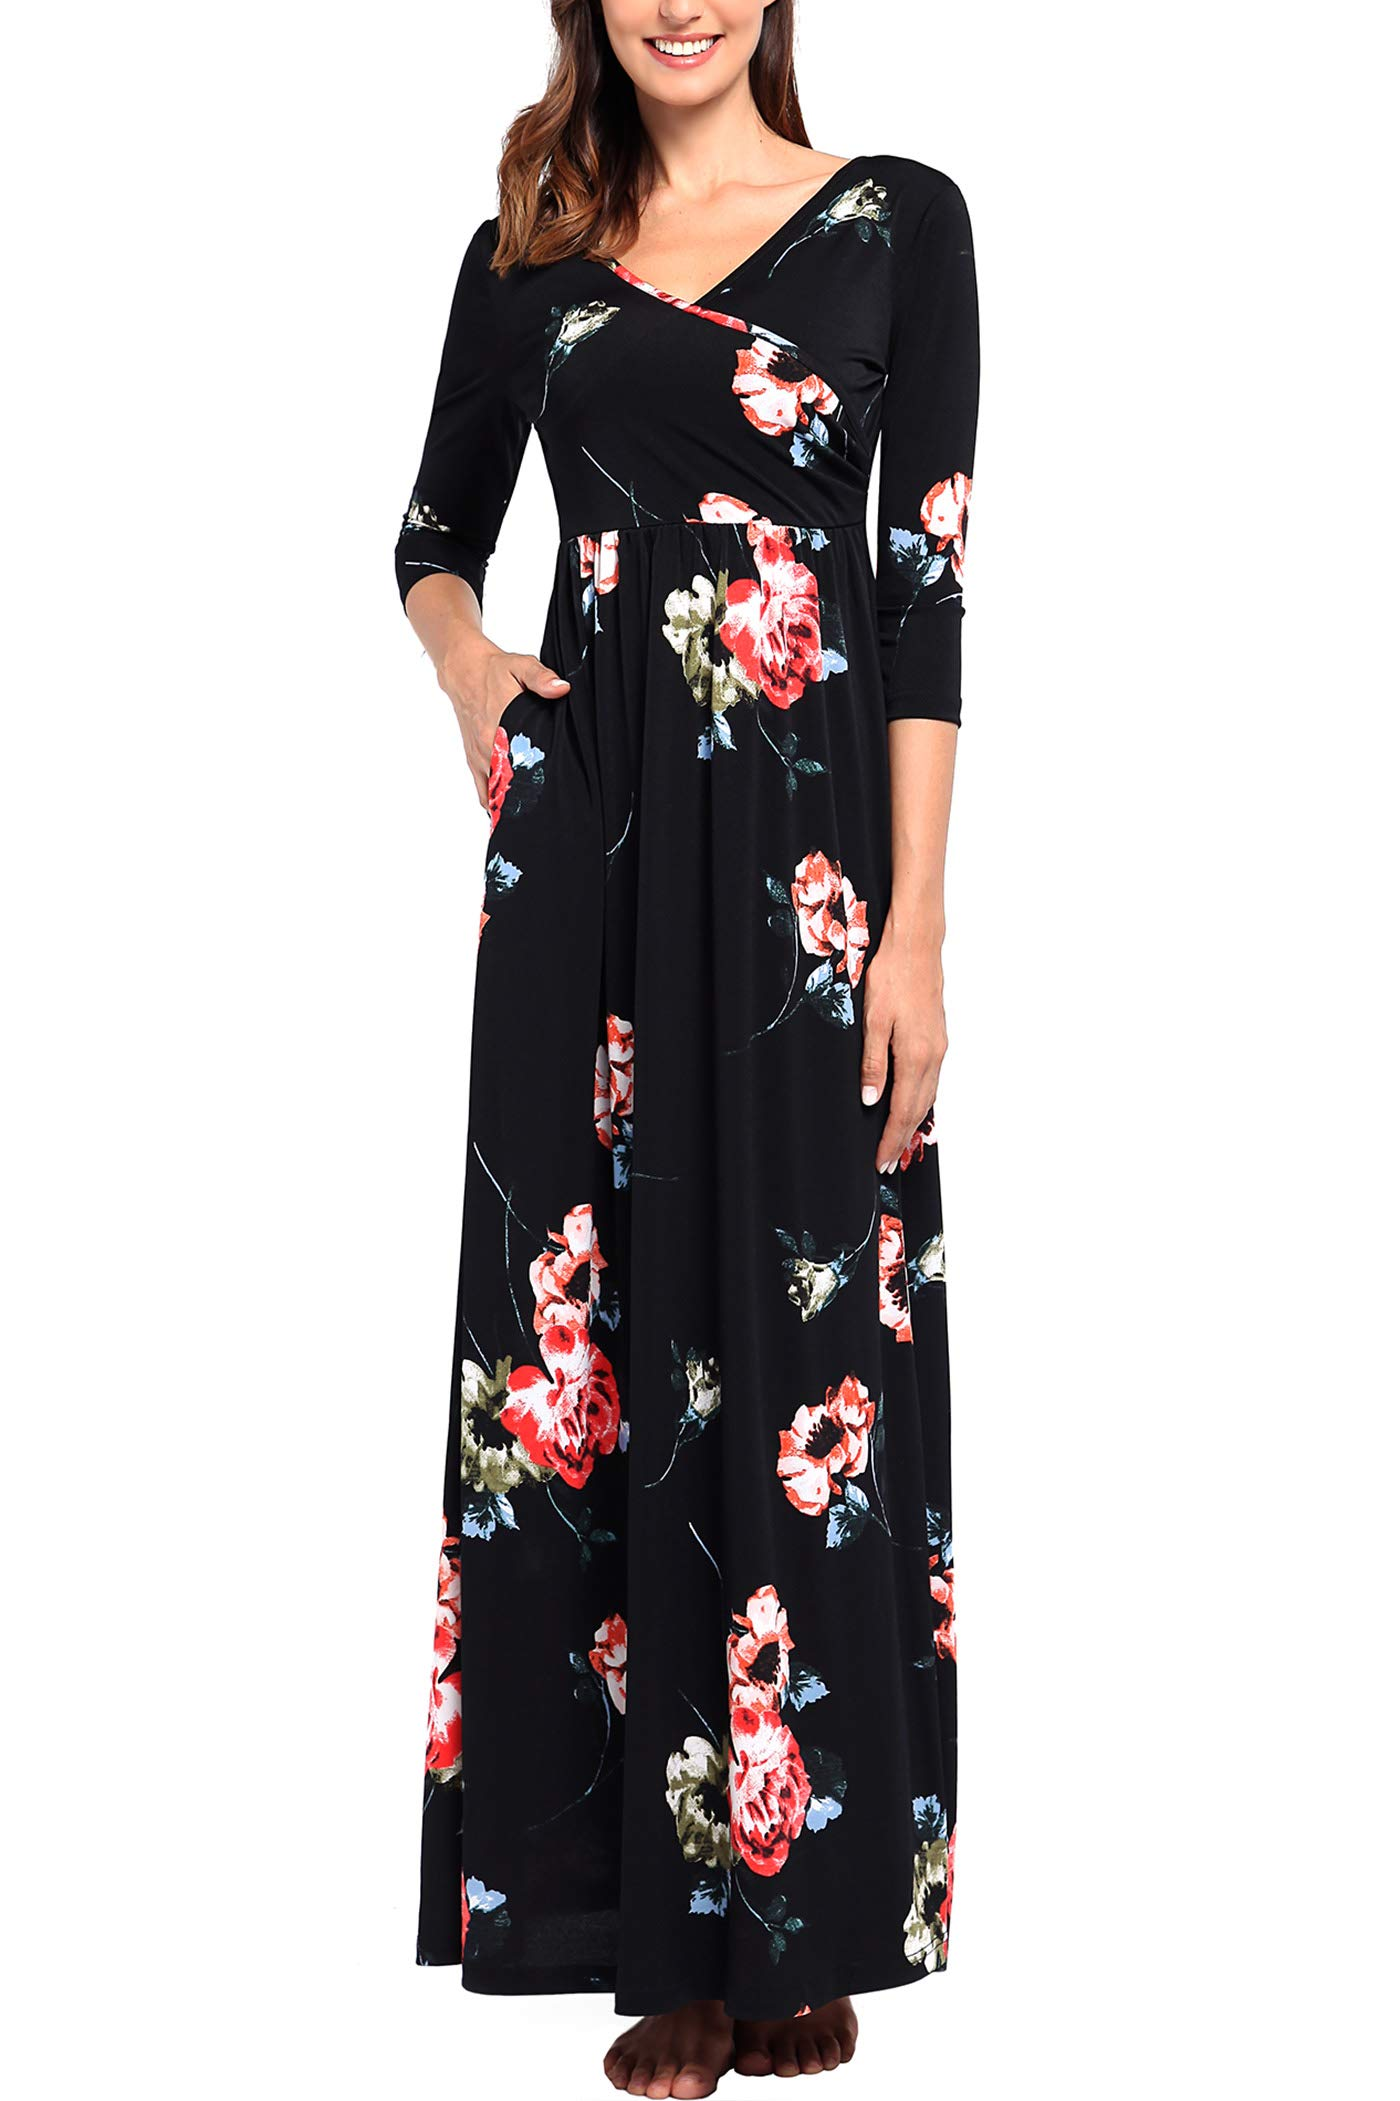 Comila V Neck Maxi Dresses for Women with Pockets, Women Floral Petite Maxi Dresses Business Work Wrap V Neck Casual Long Dress Black L (US 12-14)